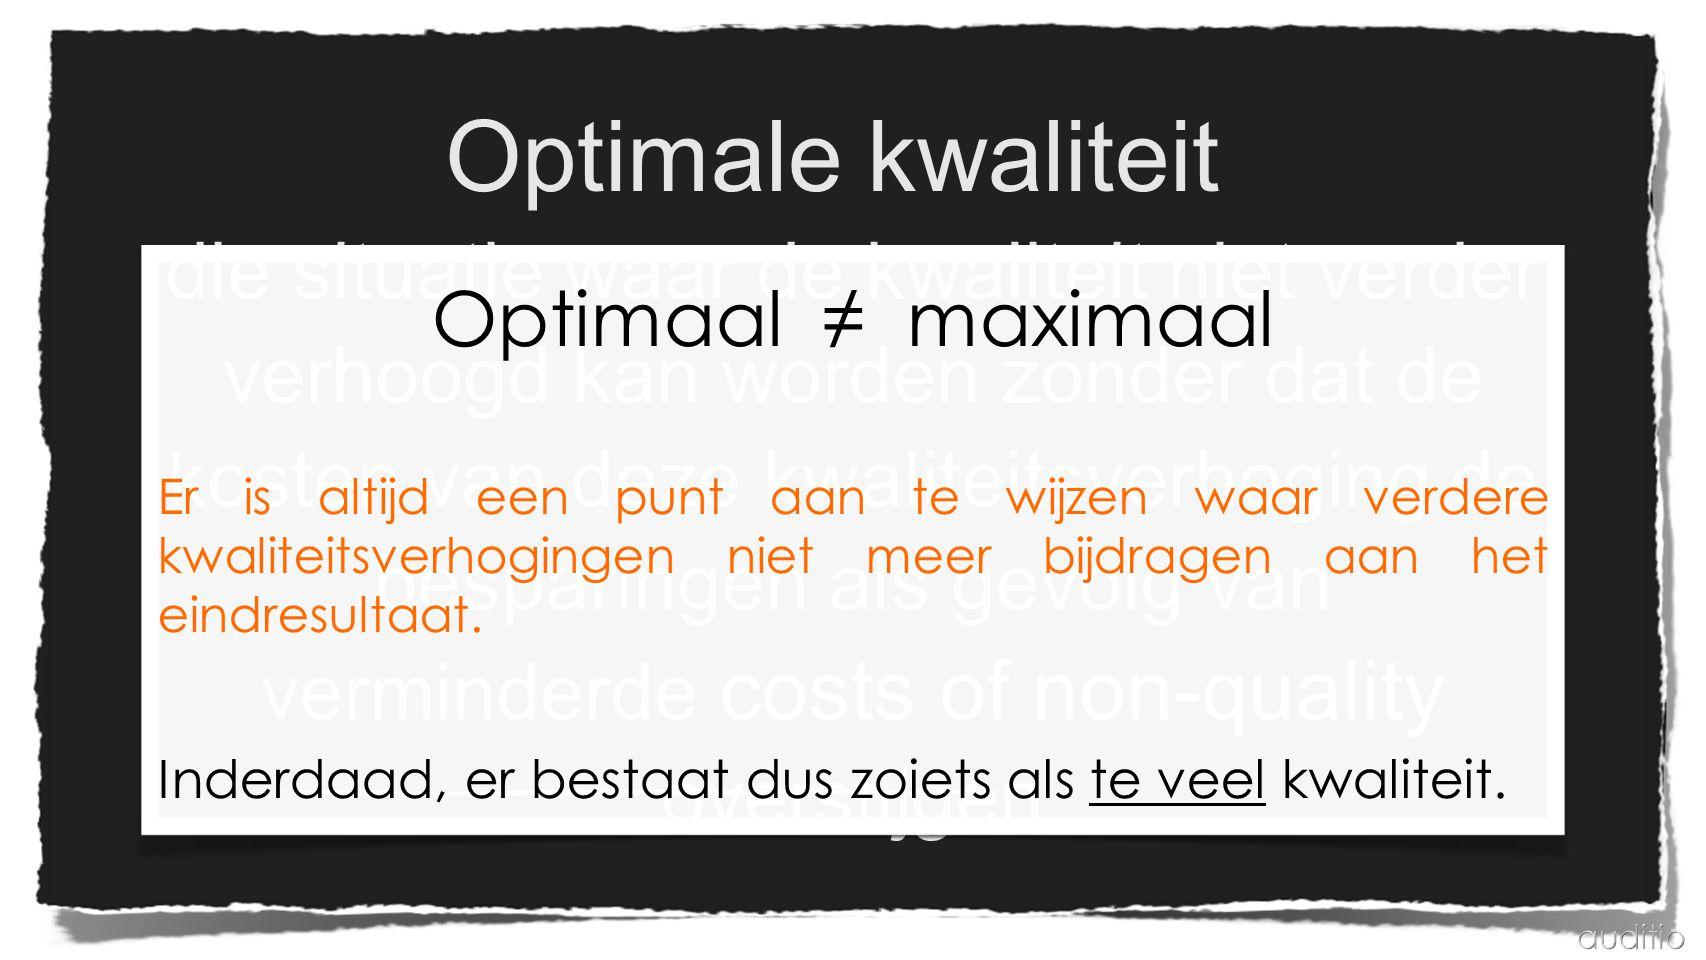 Optimale kwaliteit Optimaal ≠ maximaal.